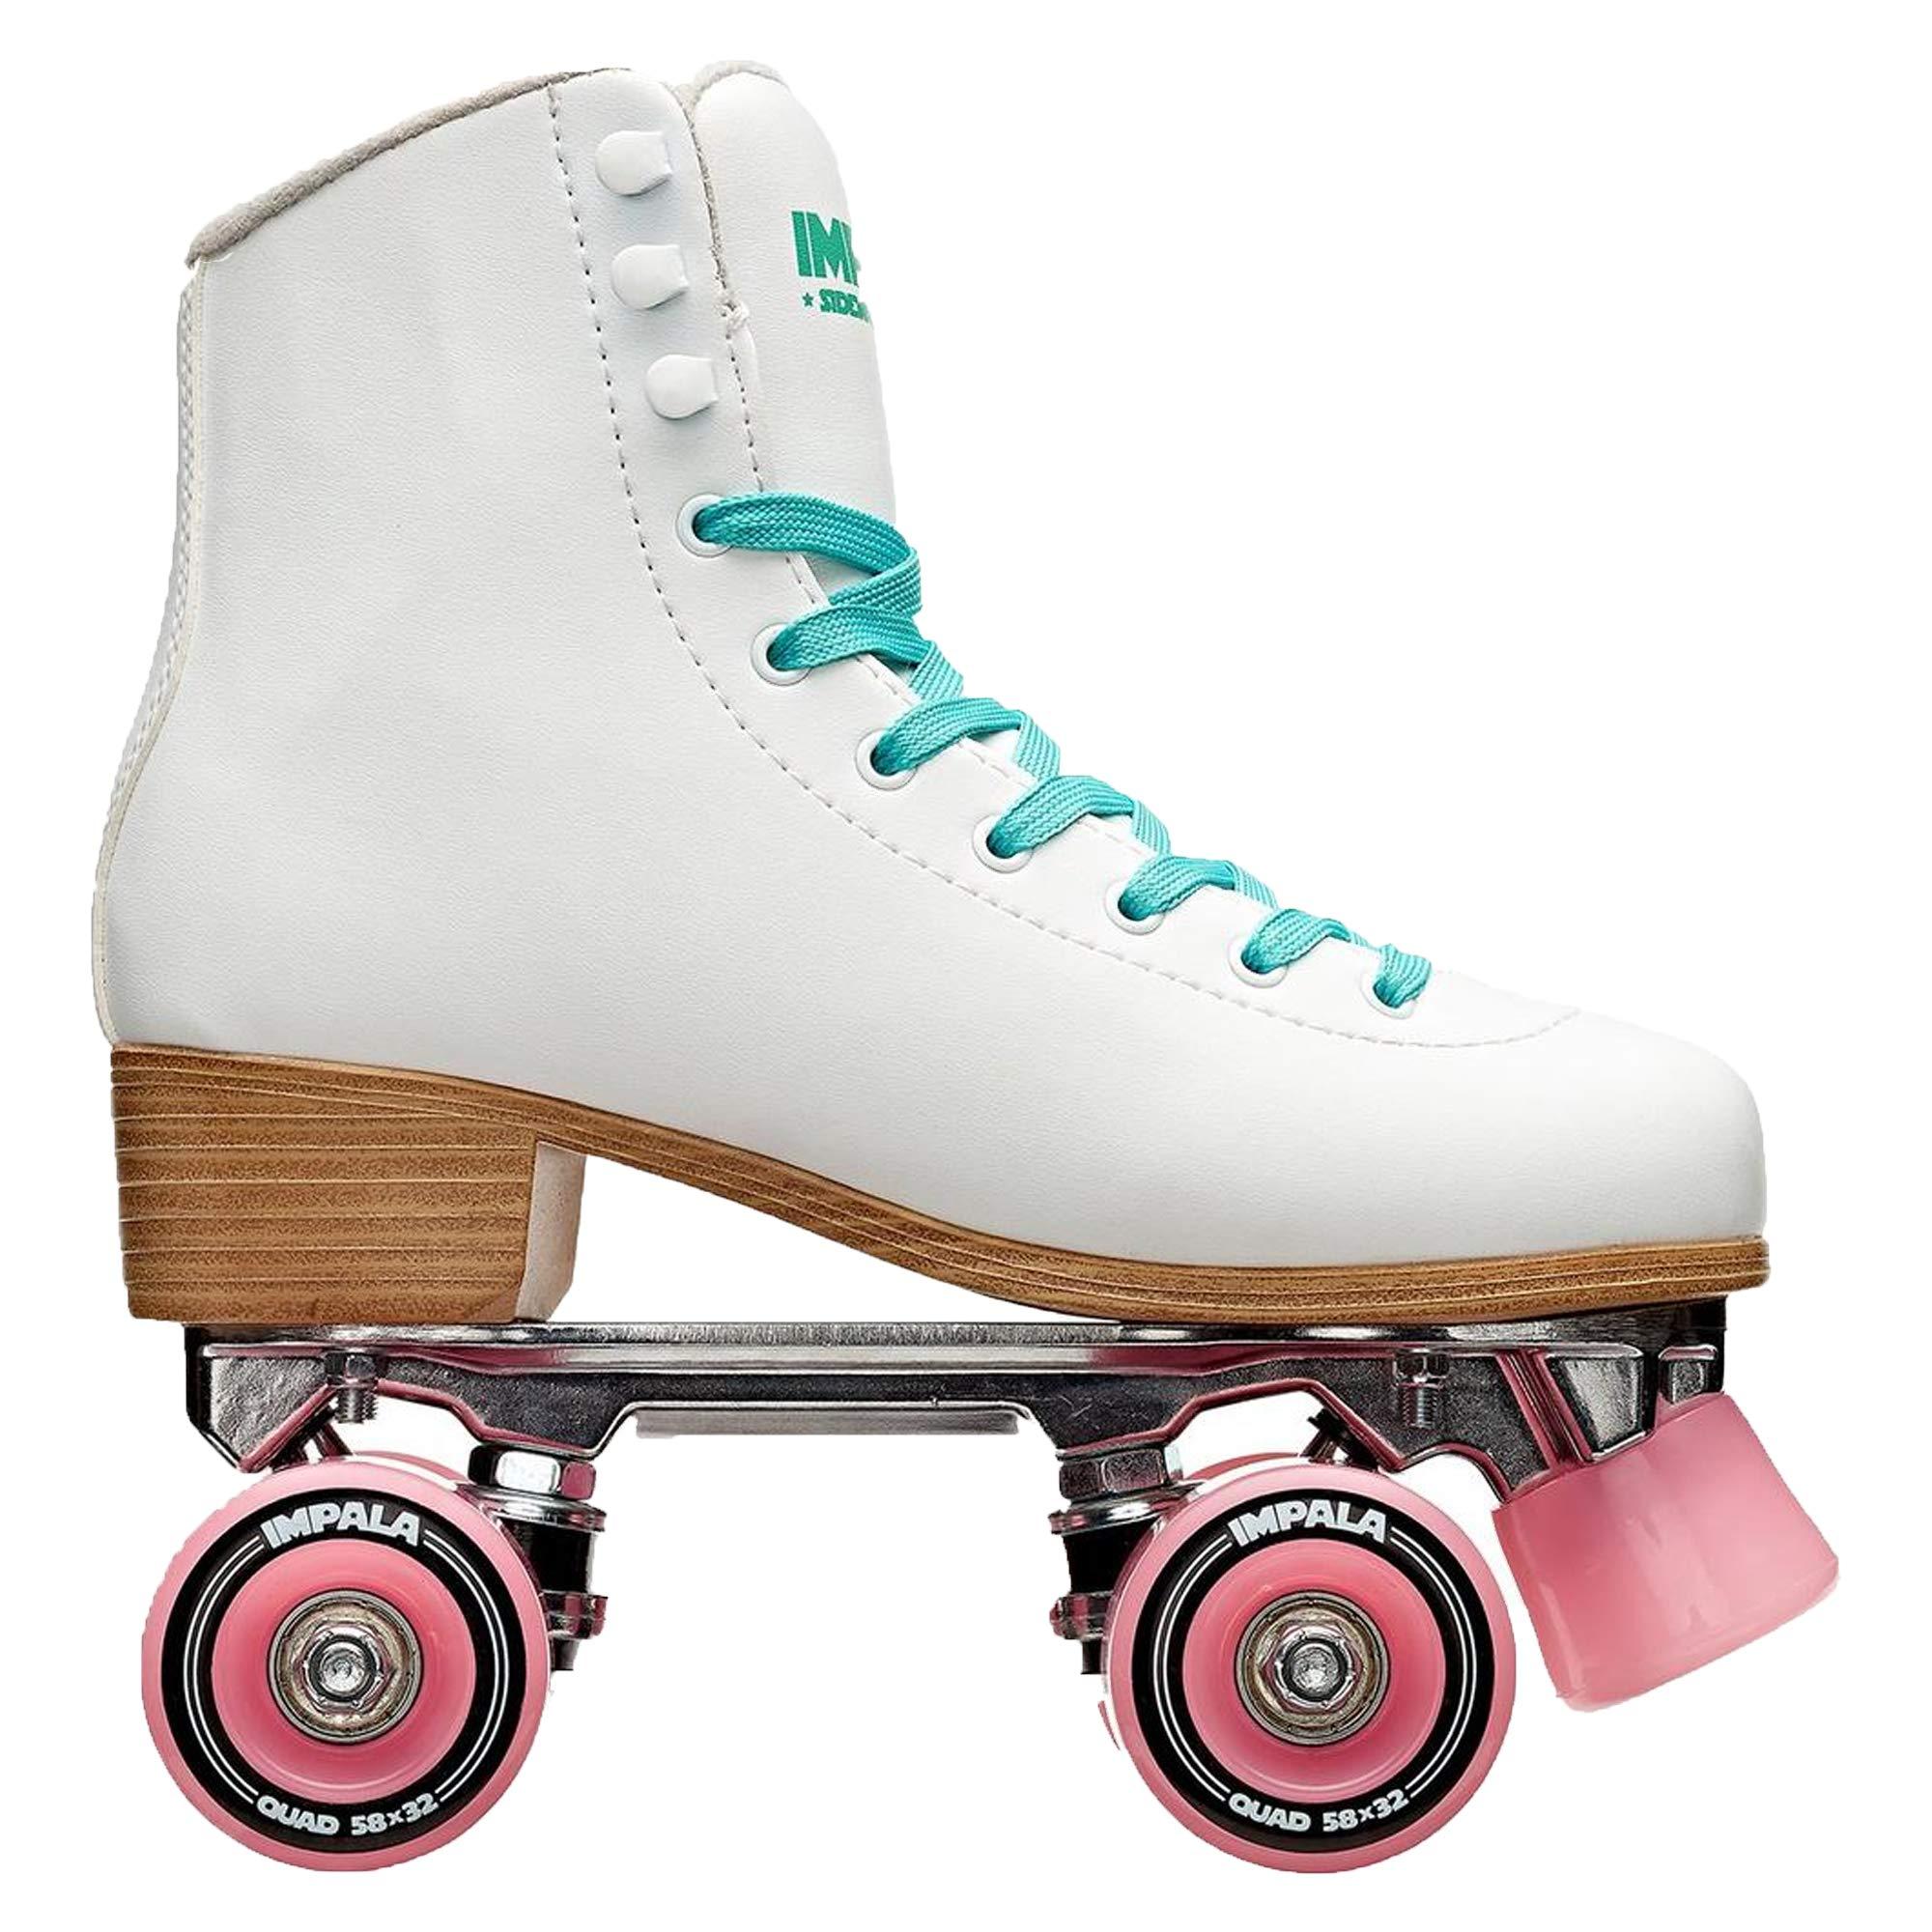 Impala RollerSkates Women's Lace-Up Rollerskates, White (100), 9